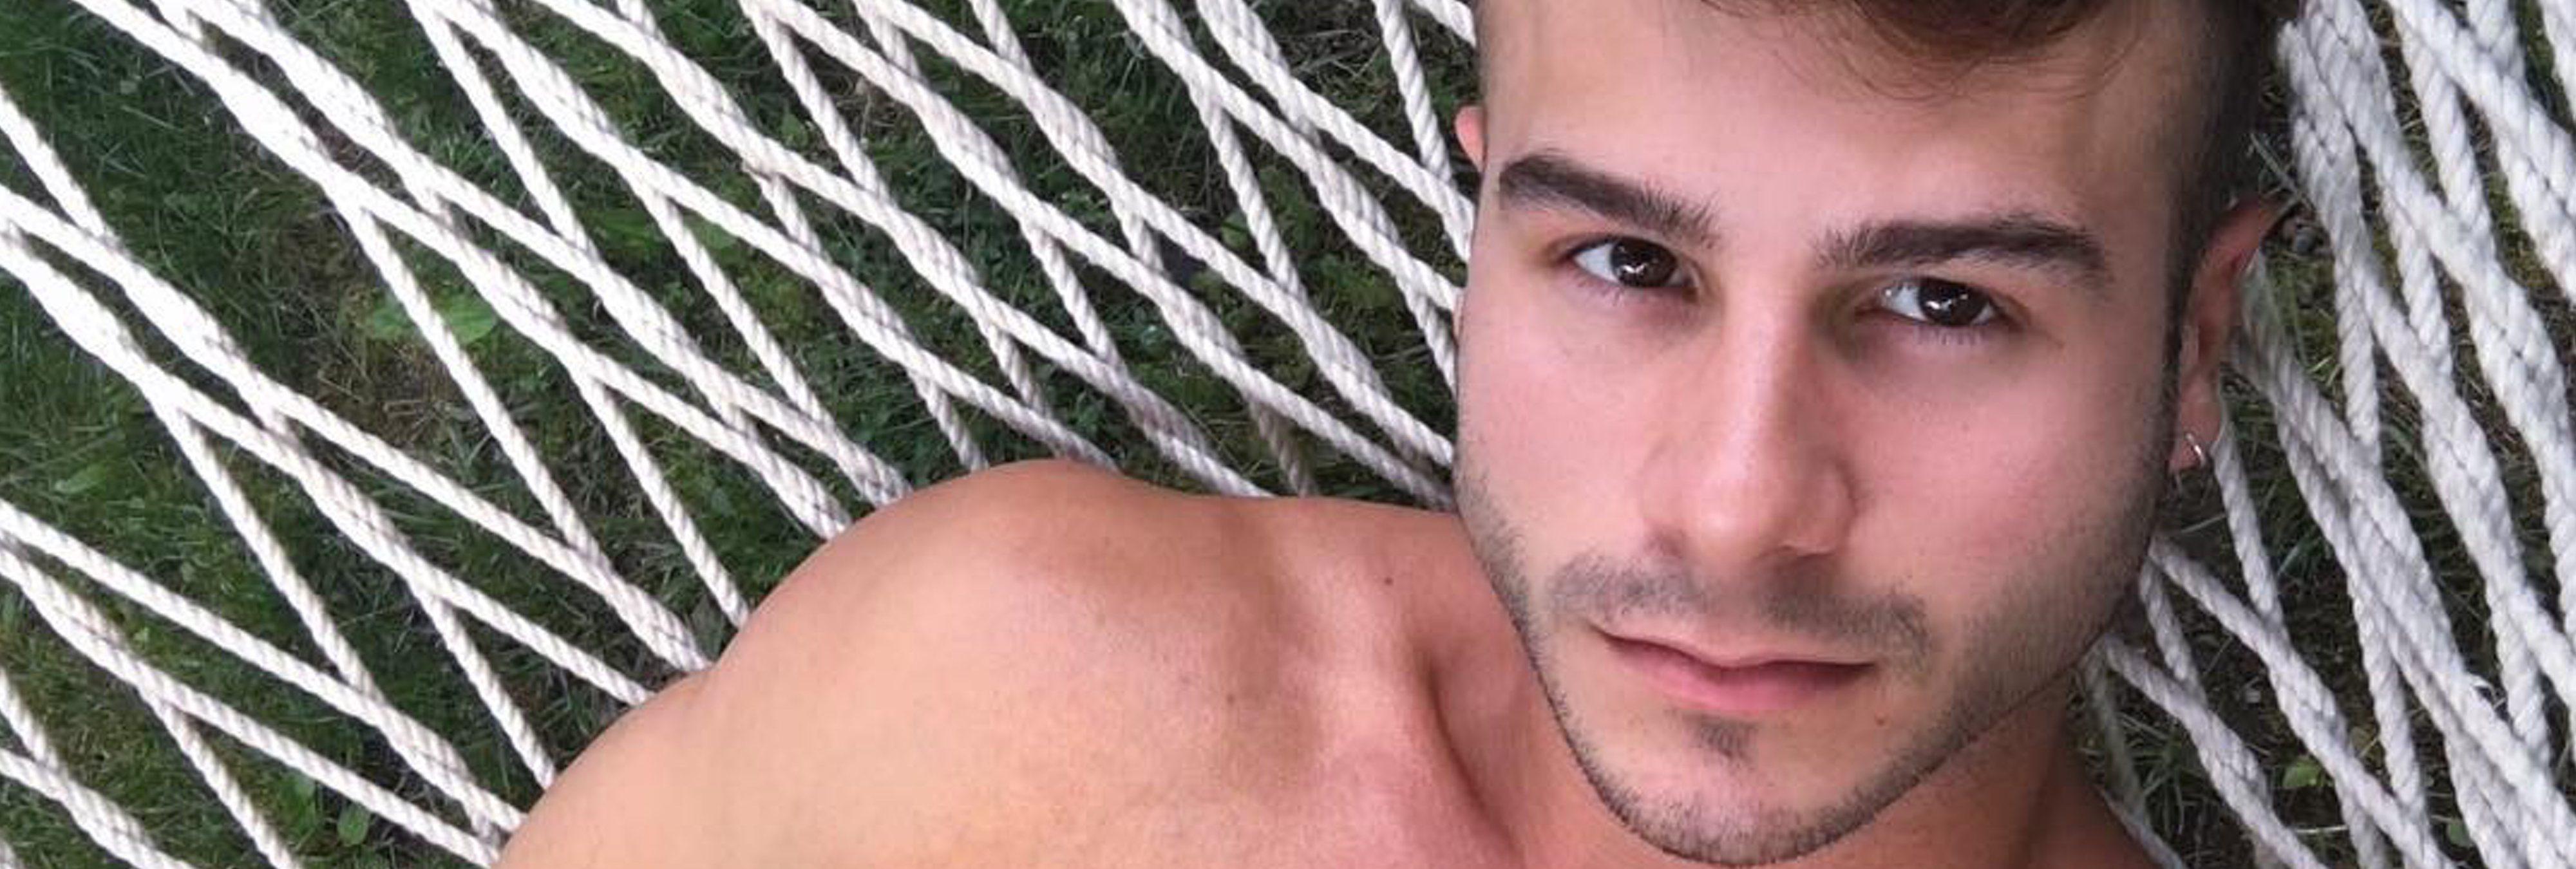 "Allen King, actor porno gay, enseña a ser ""un buen pasivo"" en un vídeo cargado de machismo y pasivofobia"